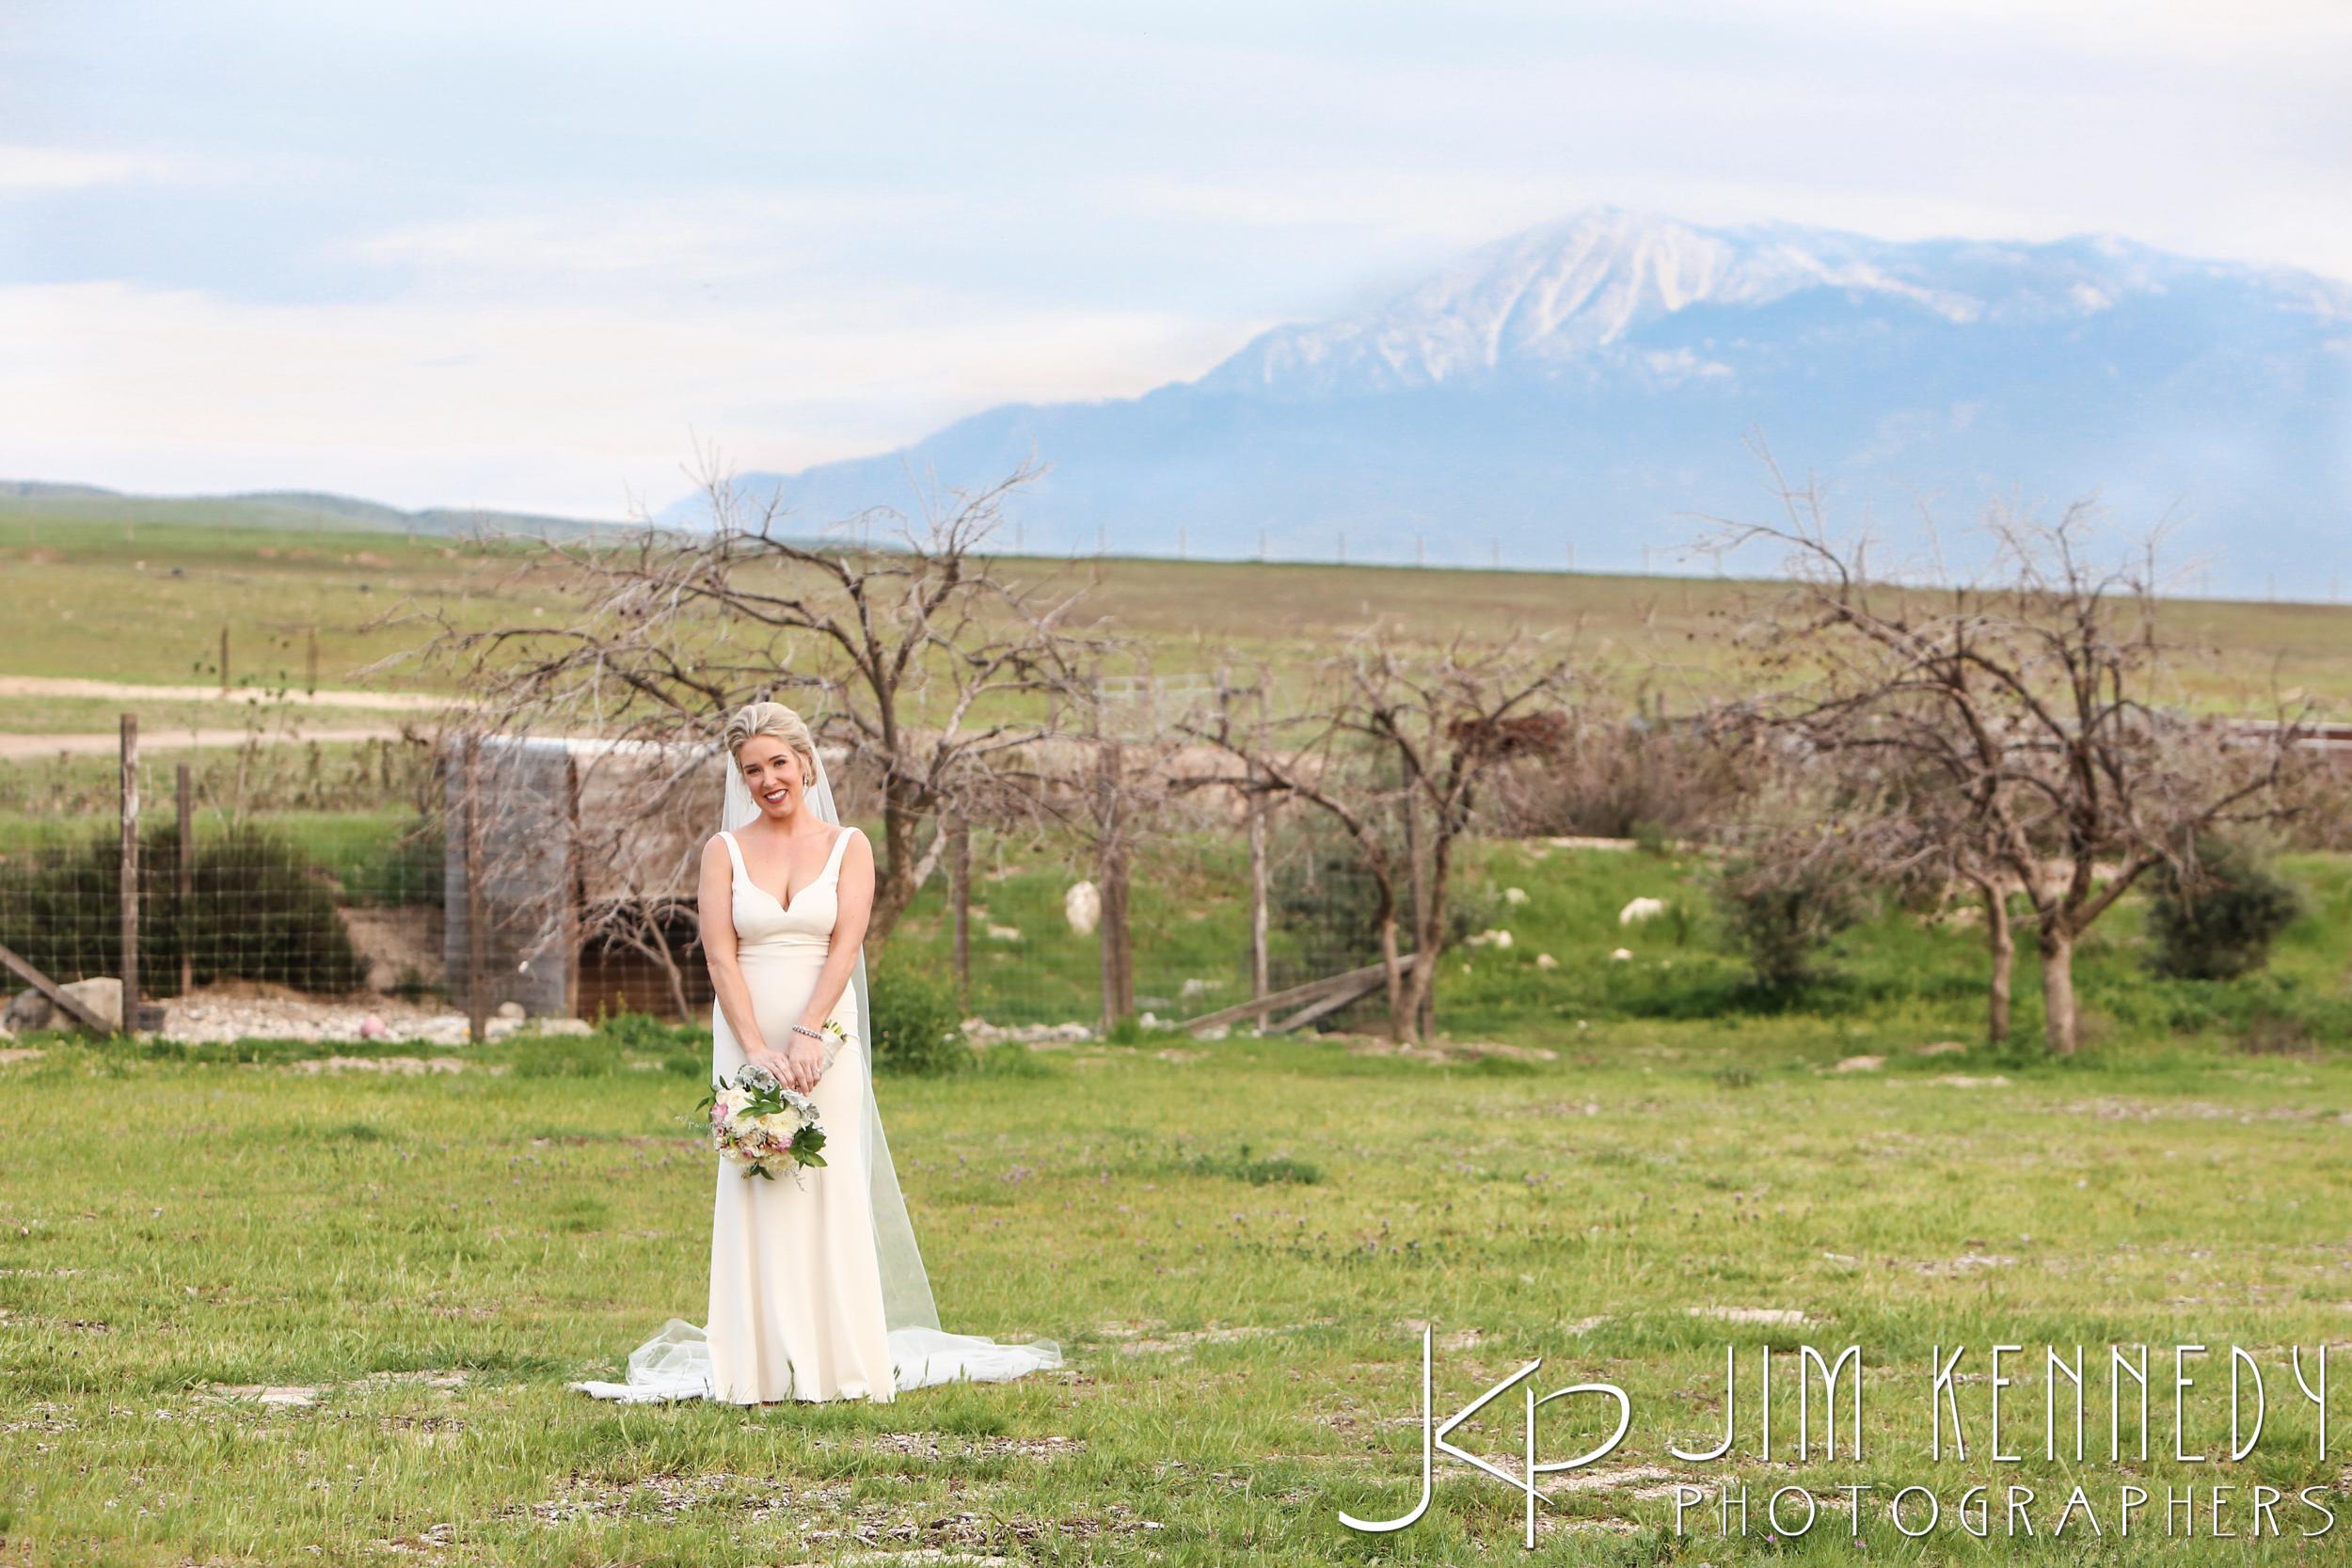 jim_kennedy_photographers_highland_springs_wedding_caitlyn_0136.jpg